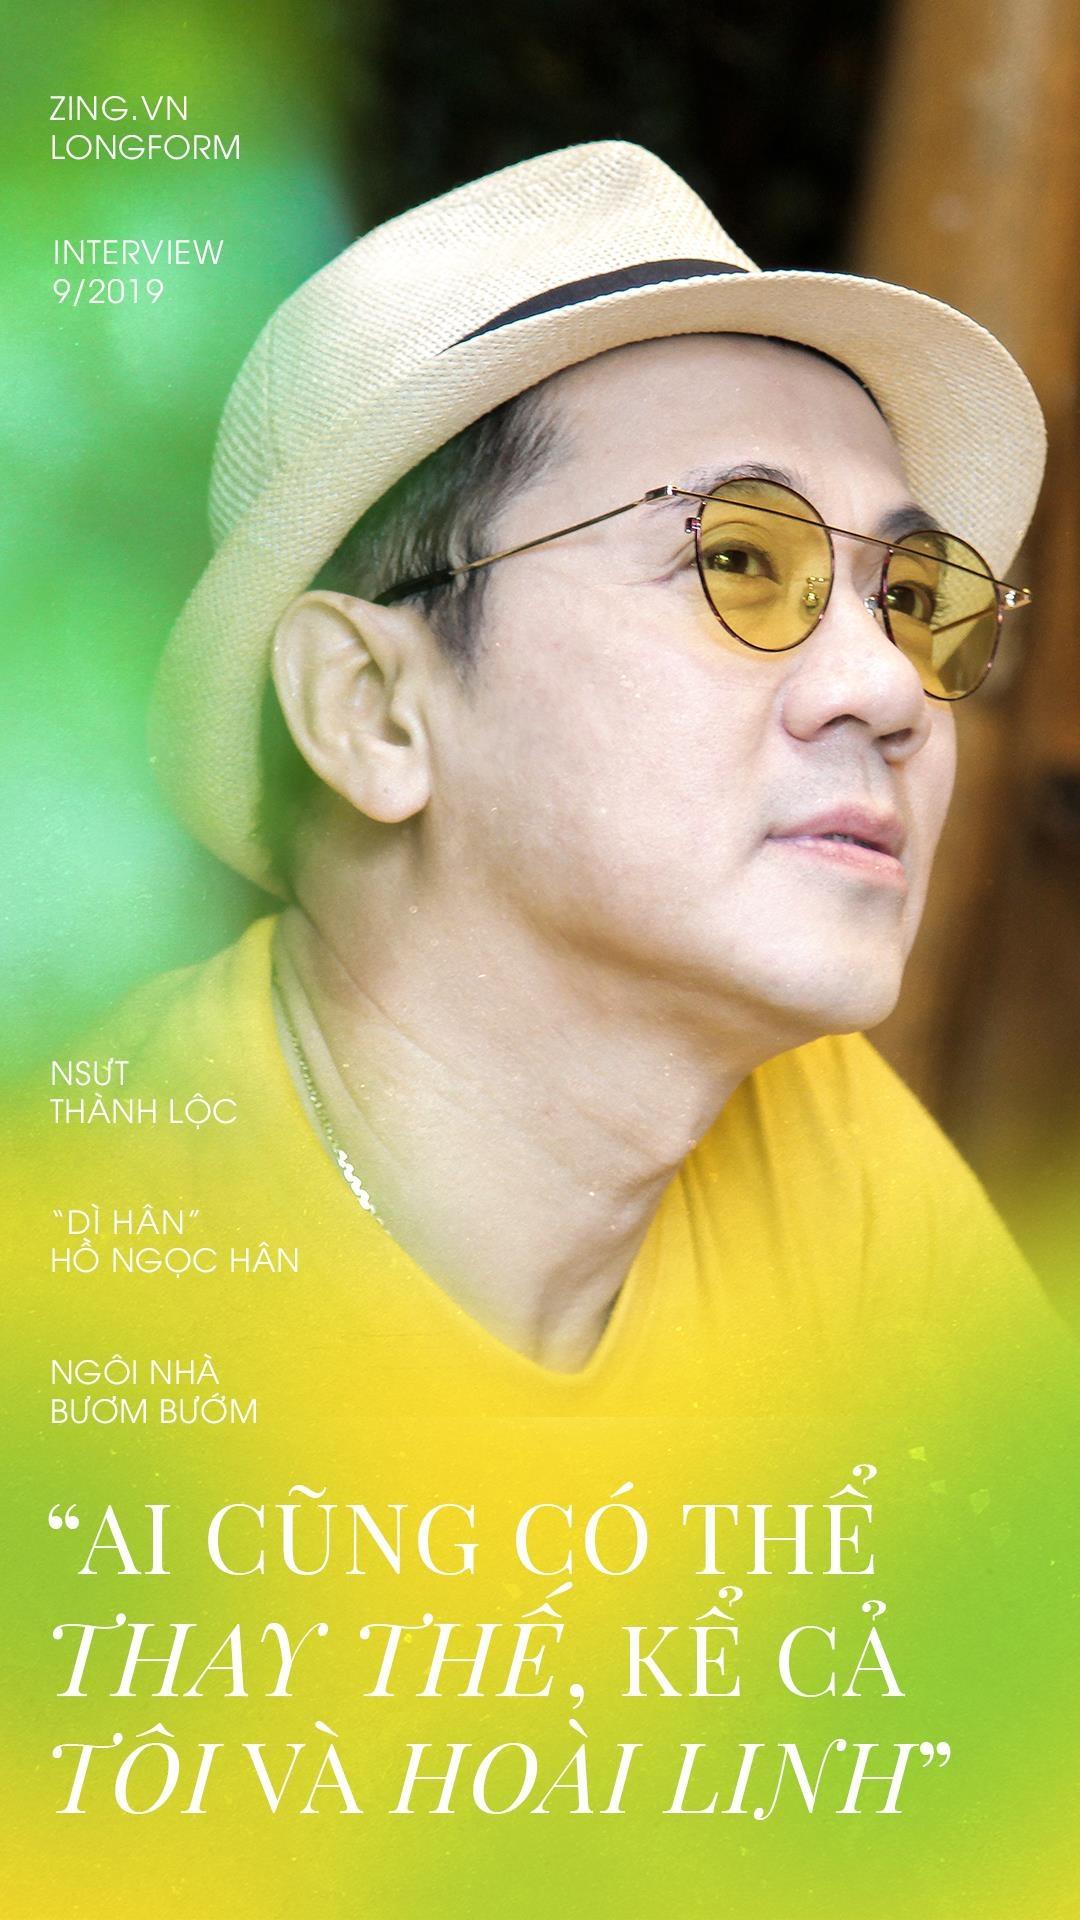 Nghe si Thanh Loc: 'Ai cung co the thay the, ke ca toi va Hoai Linh' hinh anh 1